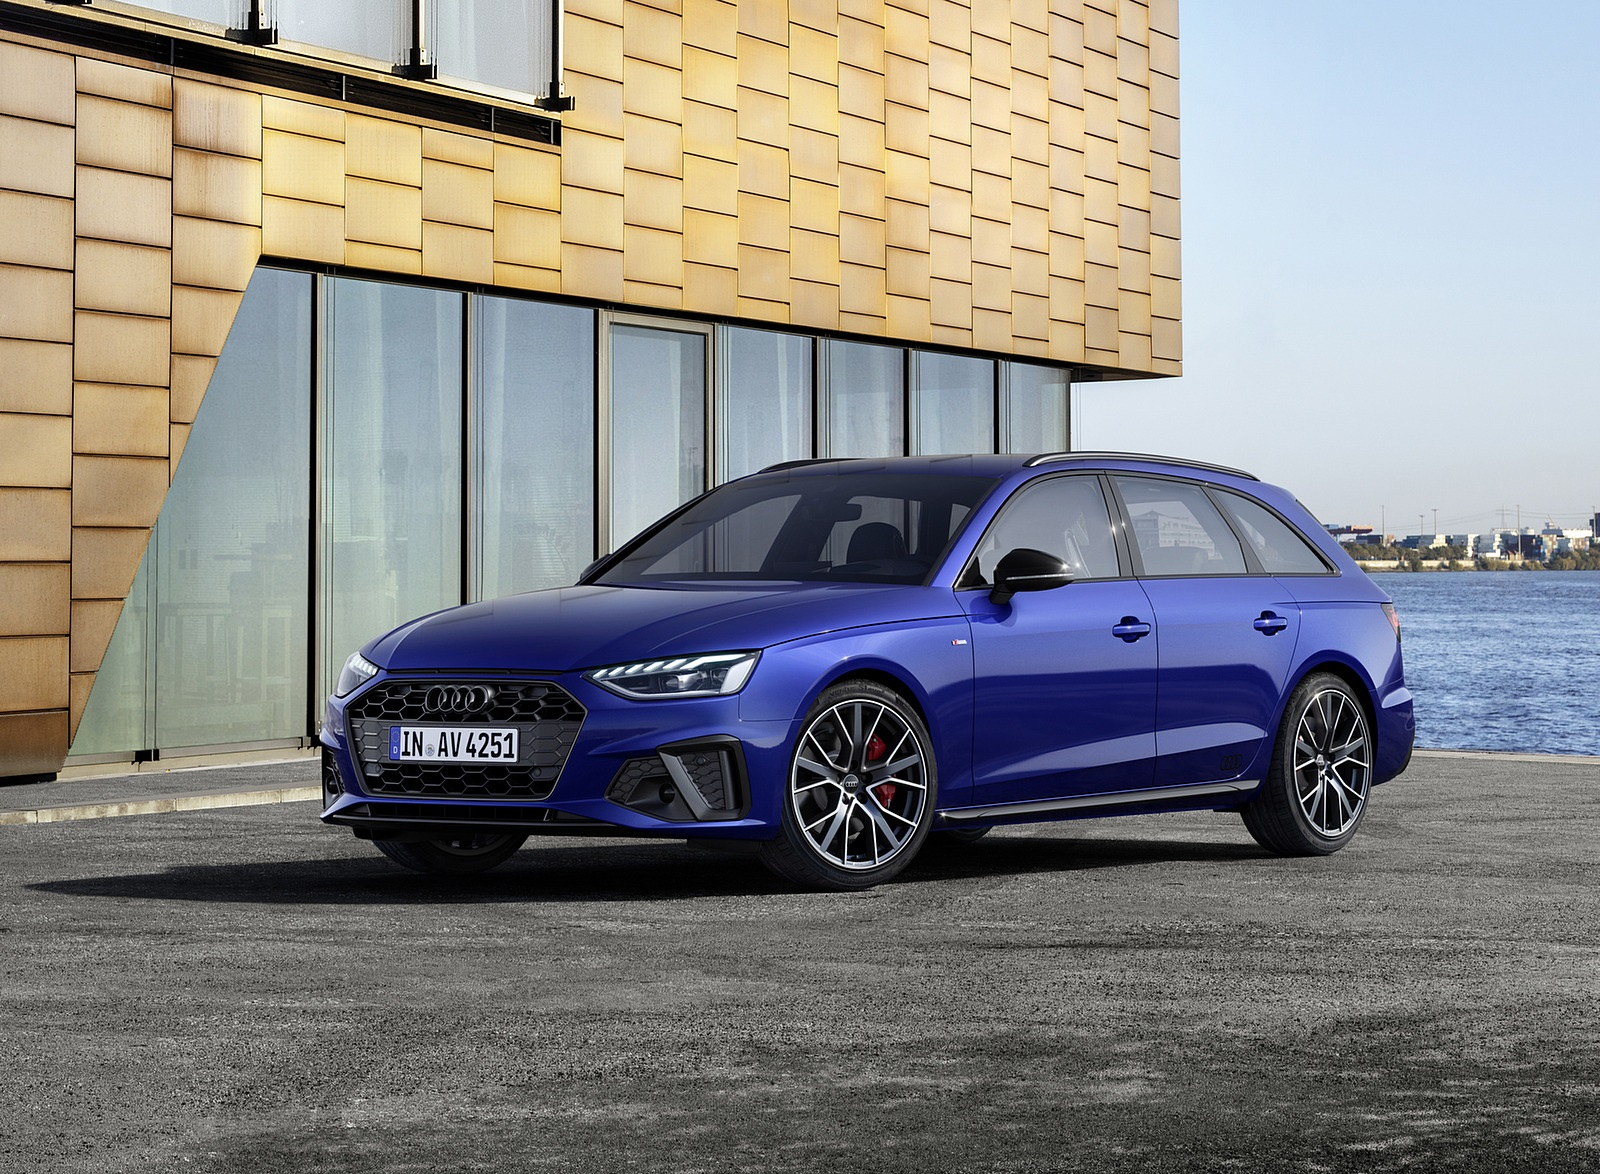 2022 Audi A4 Avant S Line Competition Plus (Color: Navarra Blue Metallic) Front Three-Quarter Wallpapers (5)